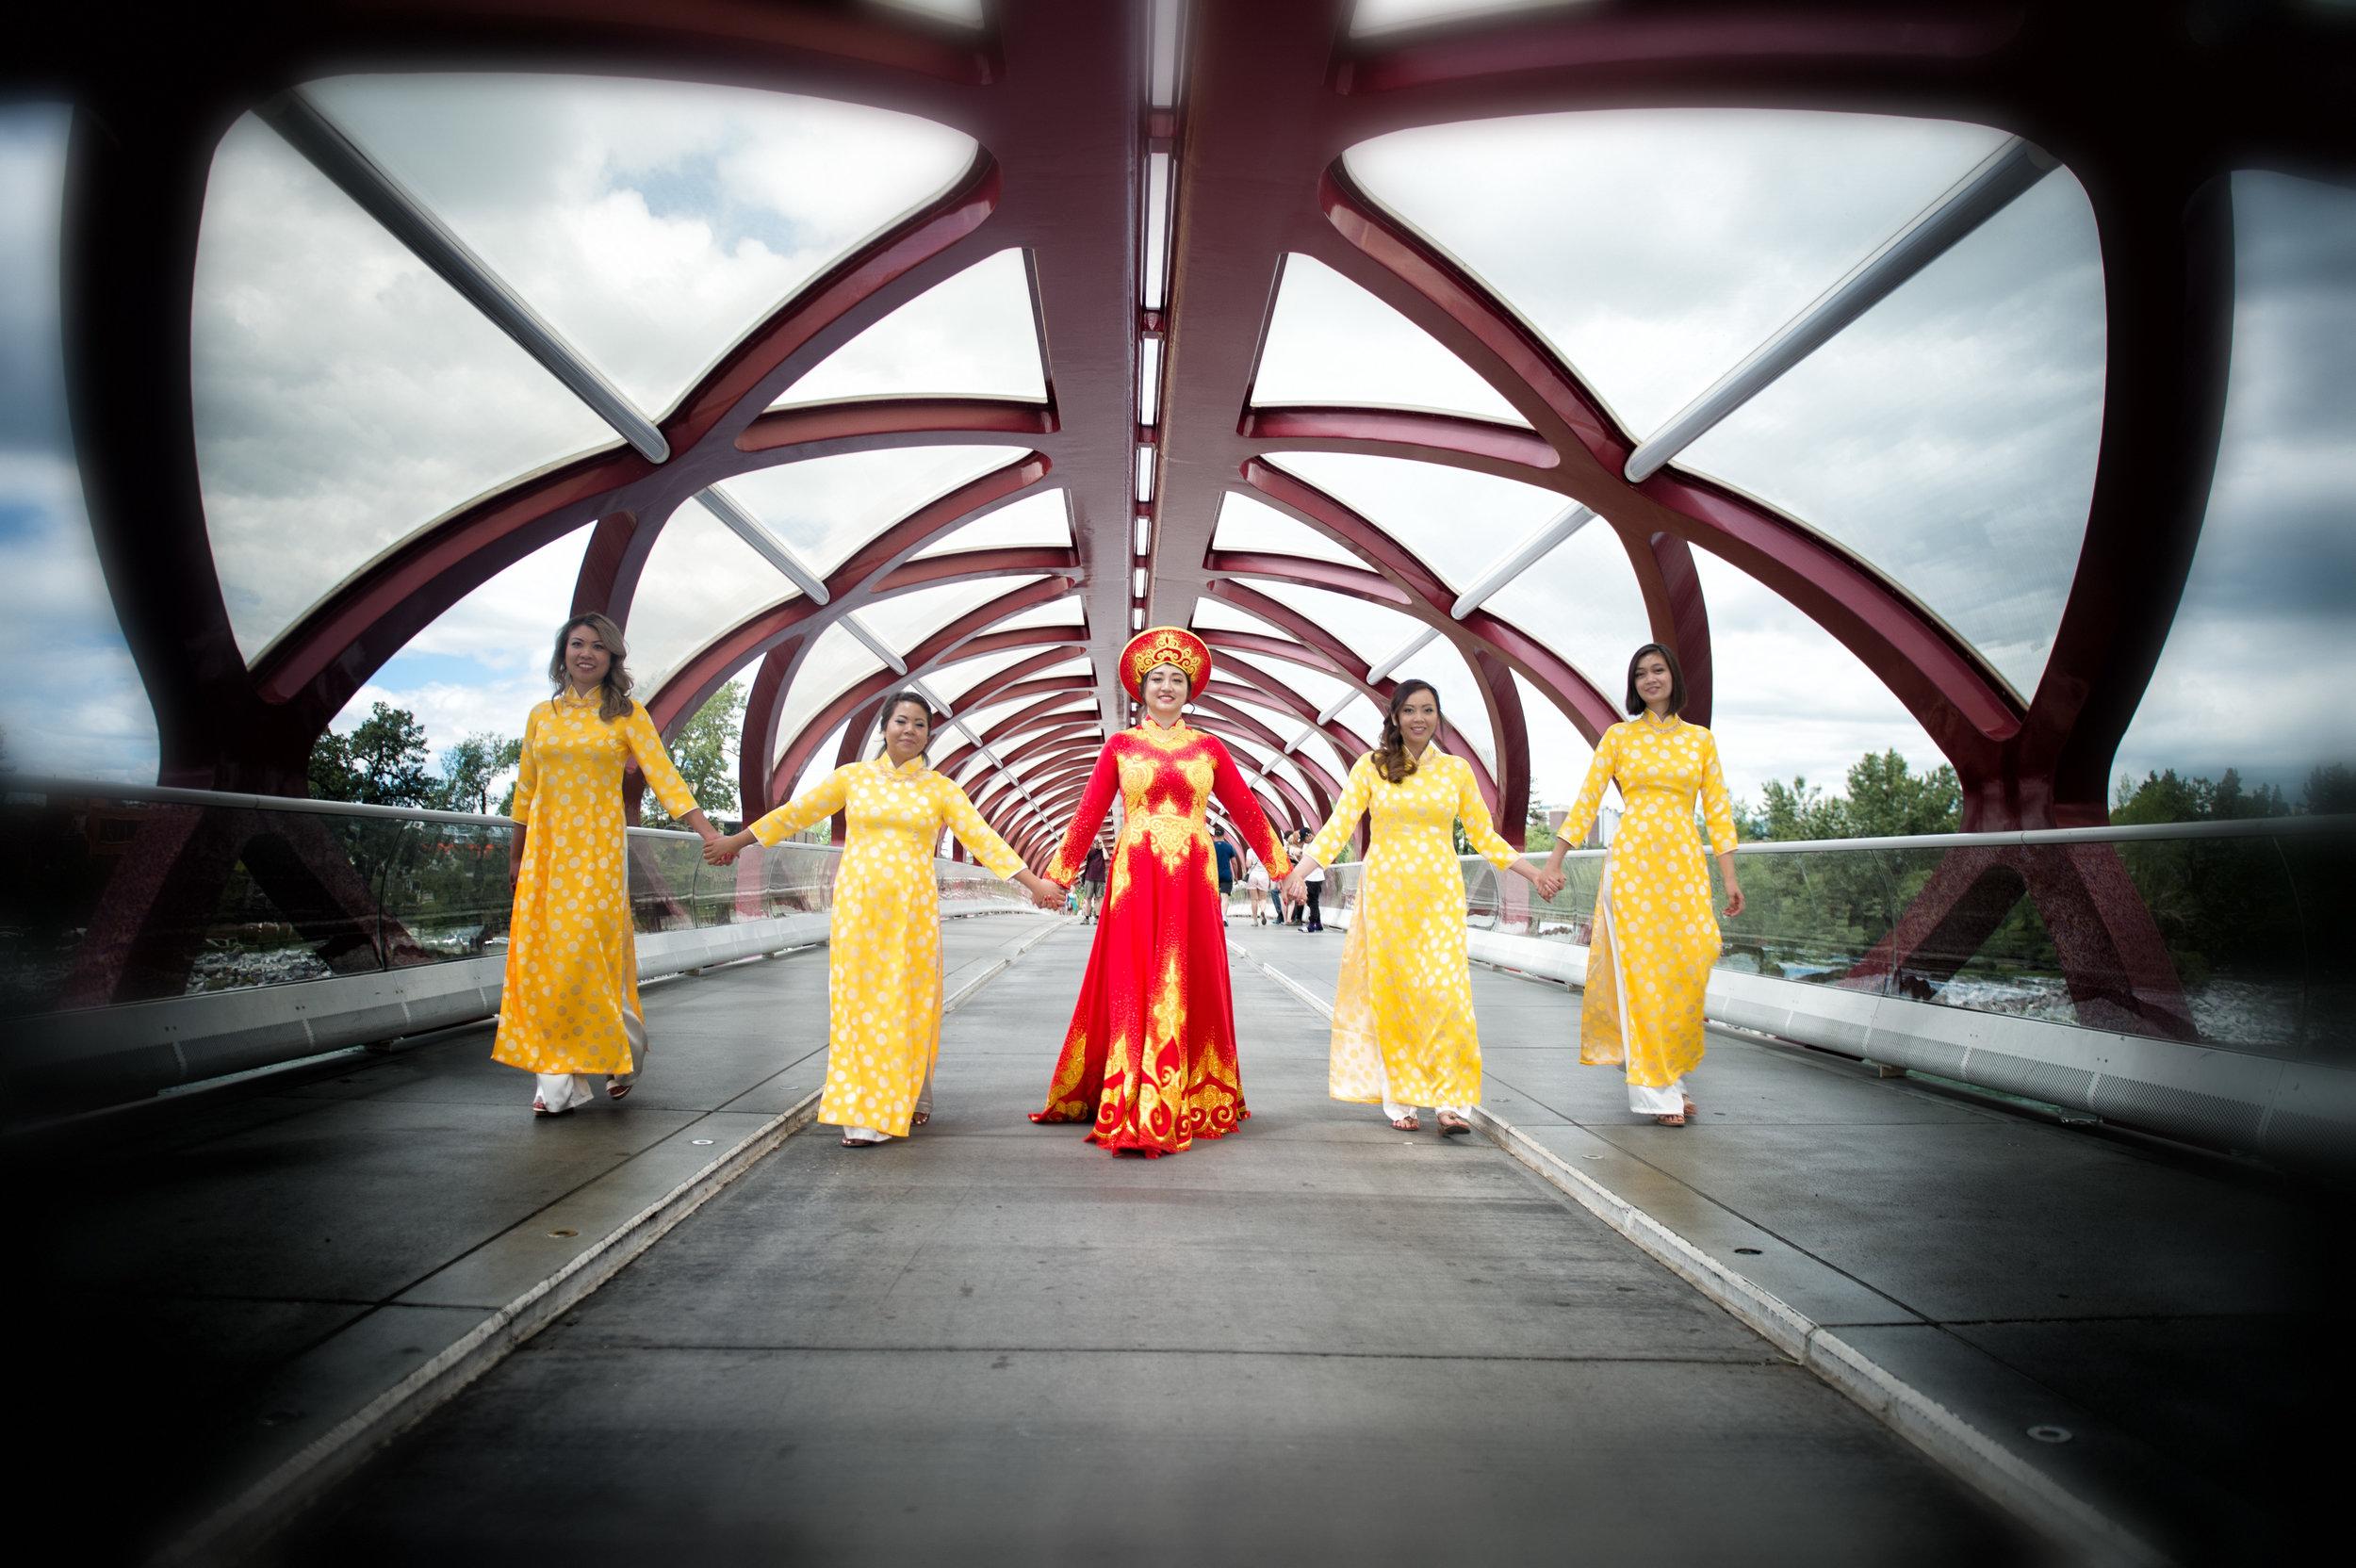 Vietnamese Wedding, shot at the Peace Bridge in Calgary